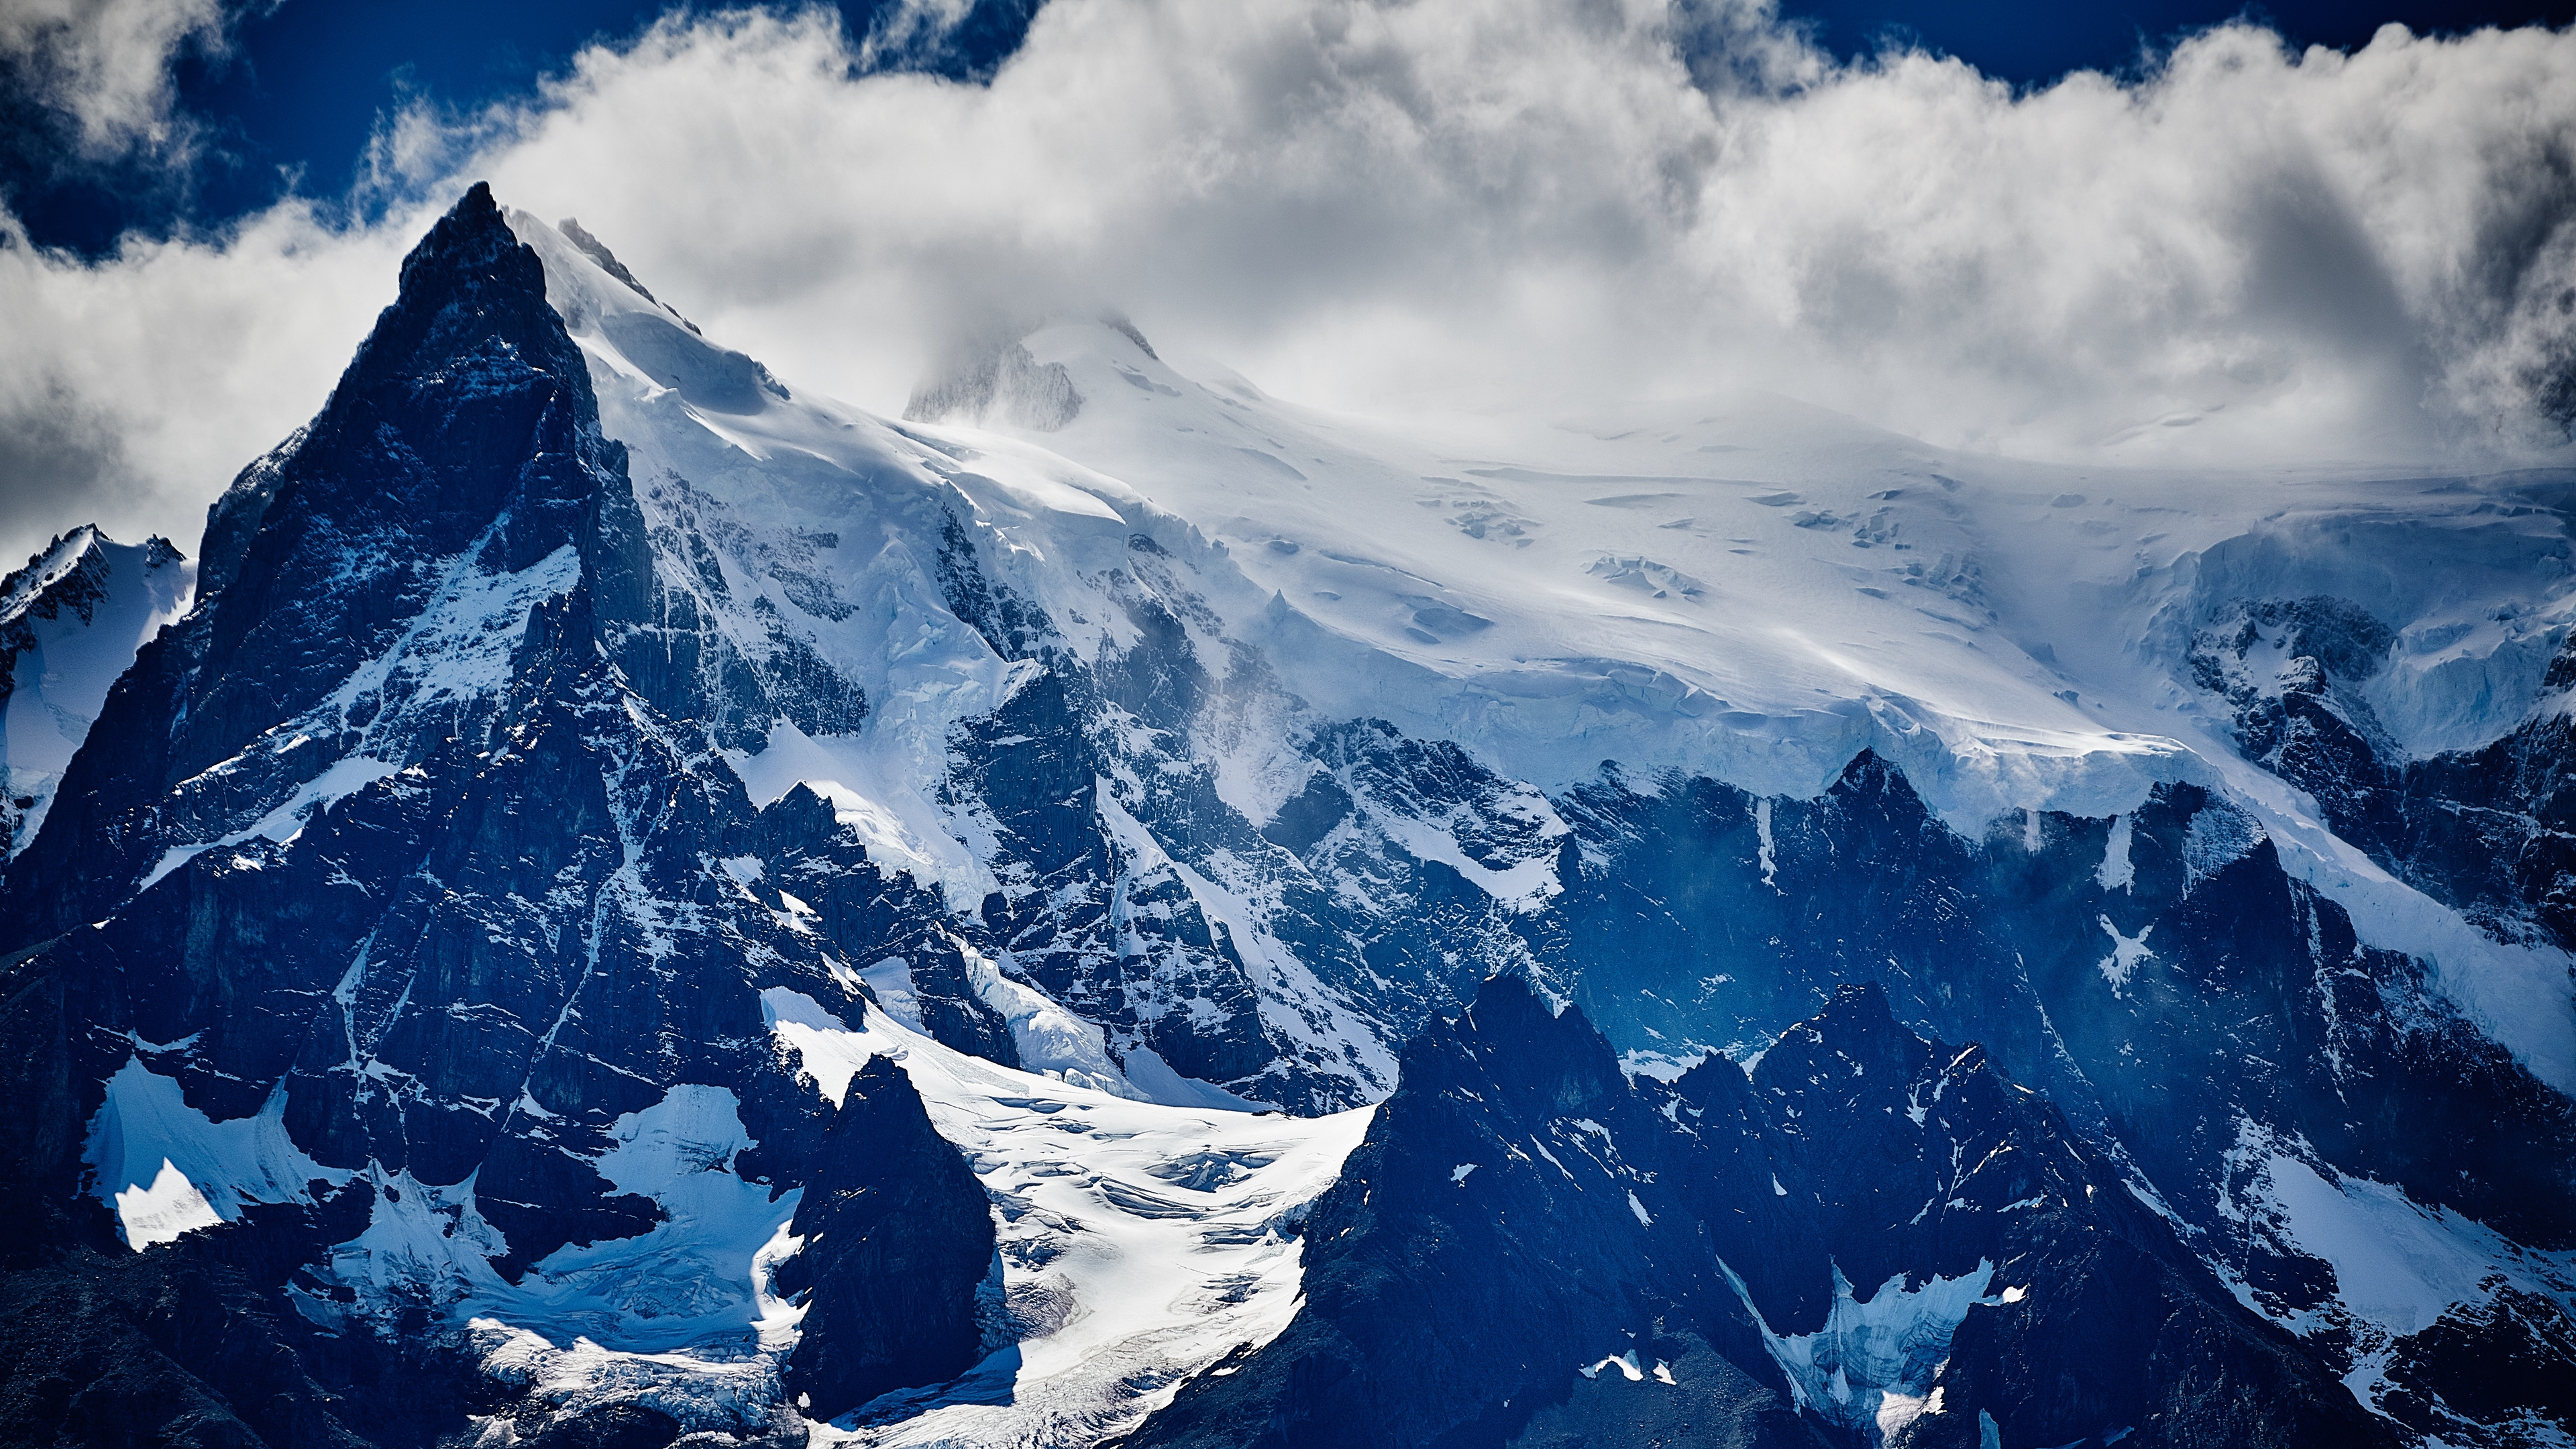 mountains high snow 4k 1541114047 - mountains, high, snow 4k - Snow, Mountains, High